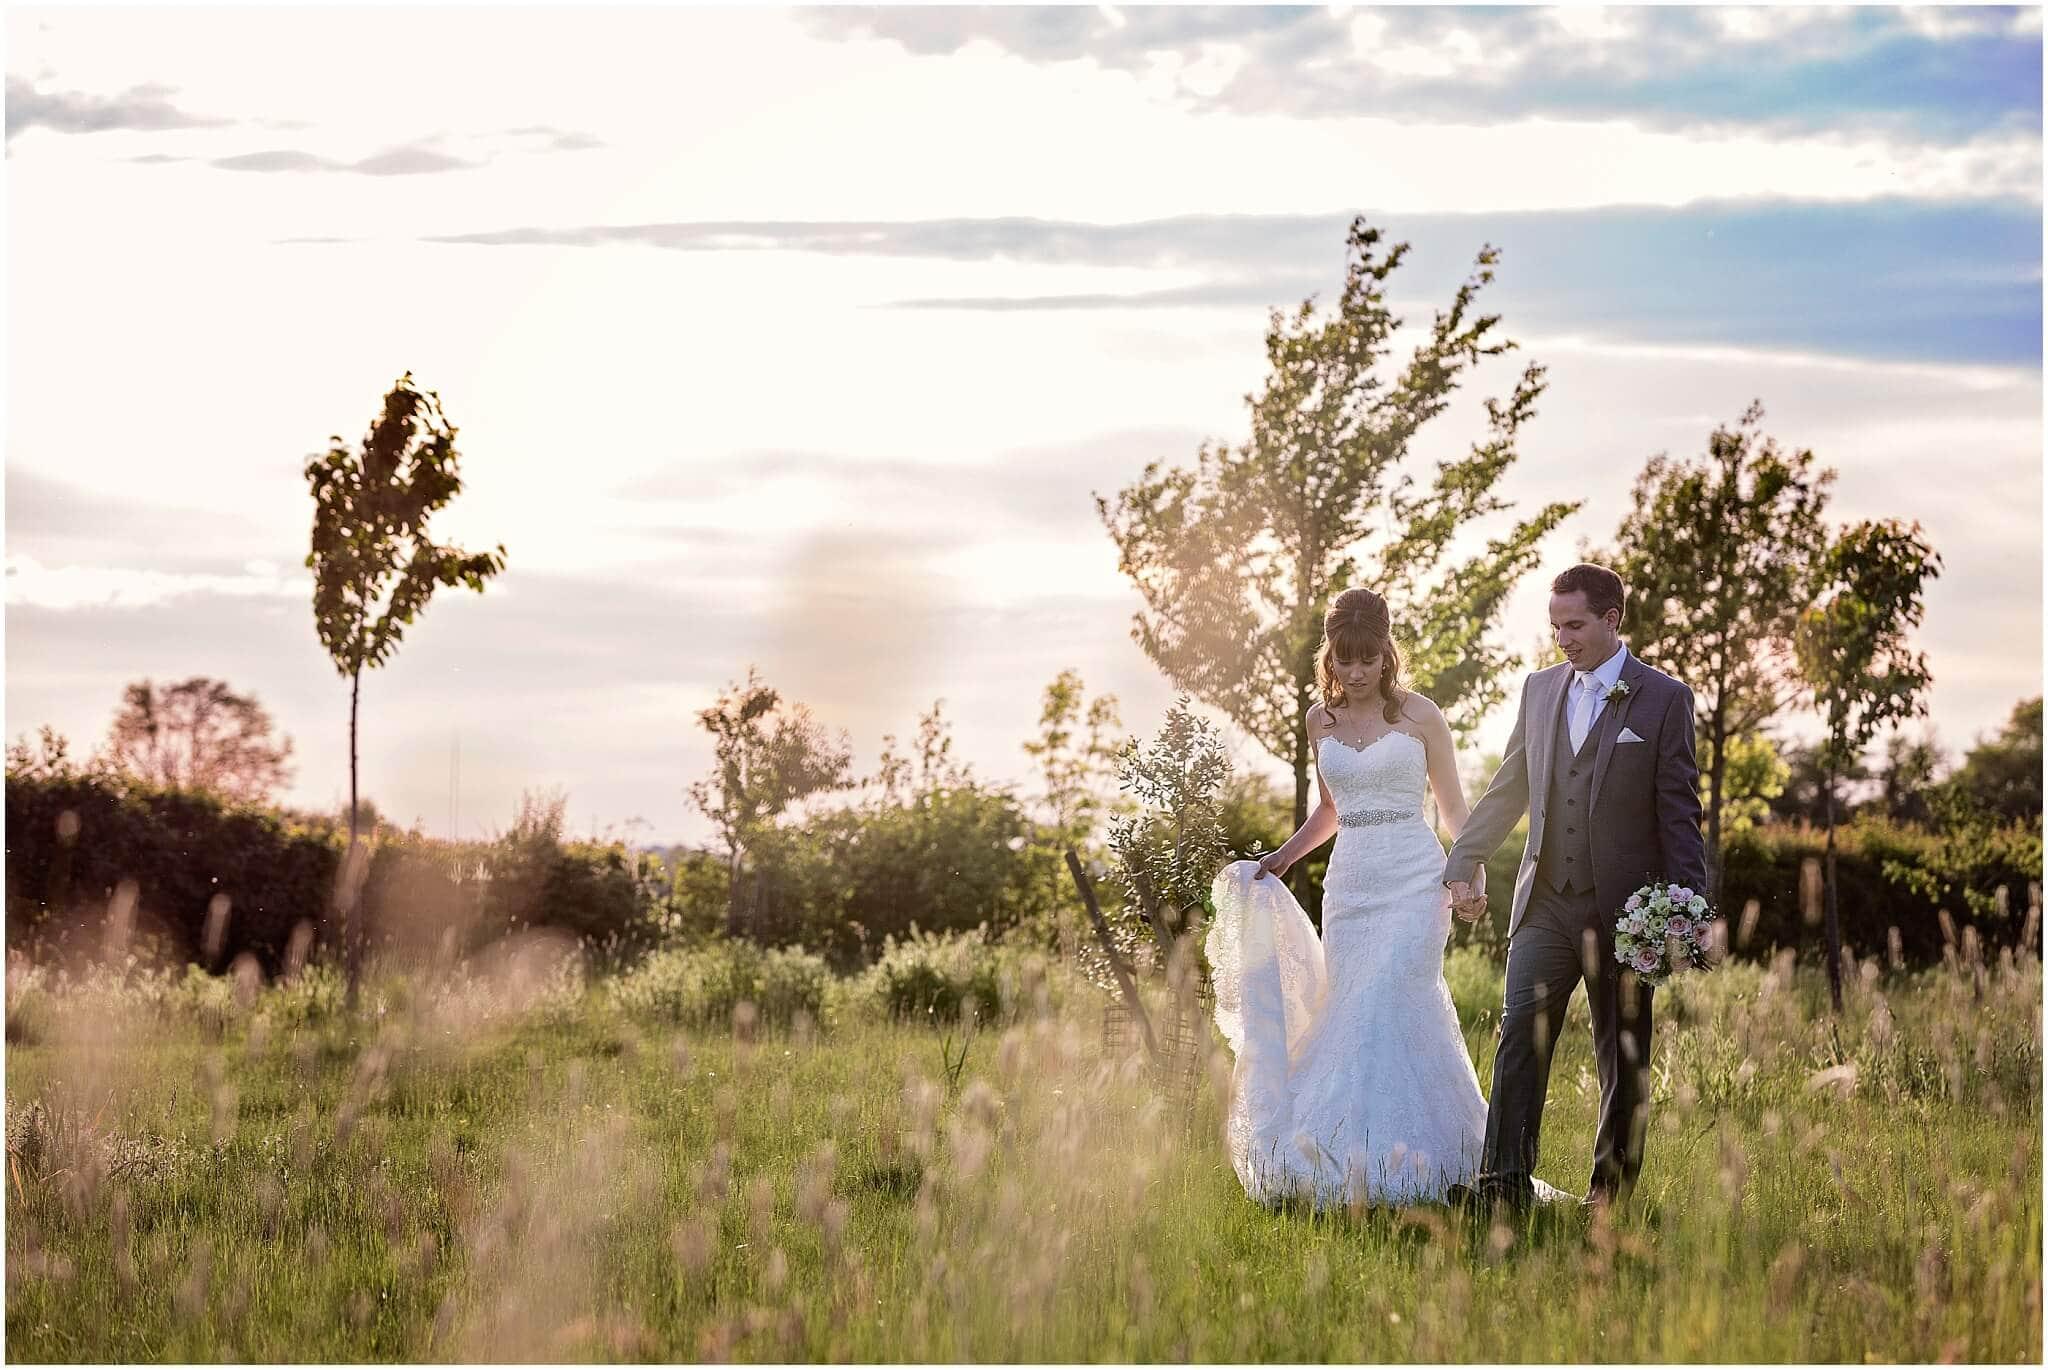 Romantic meadow walk at South Farm